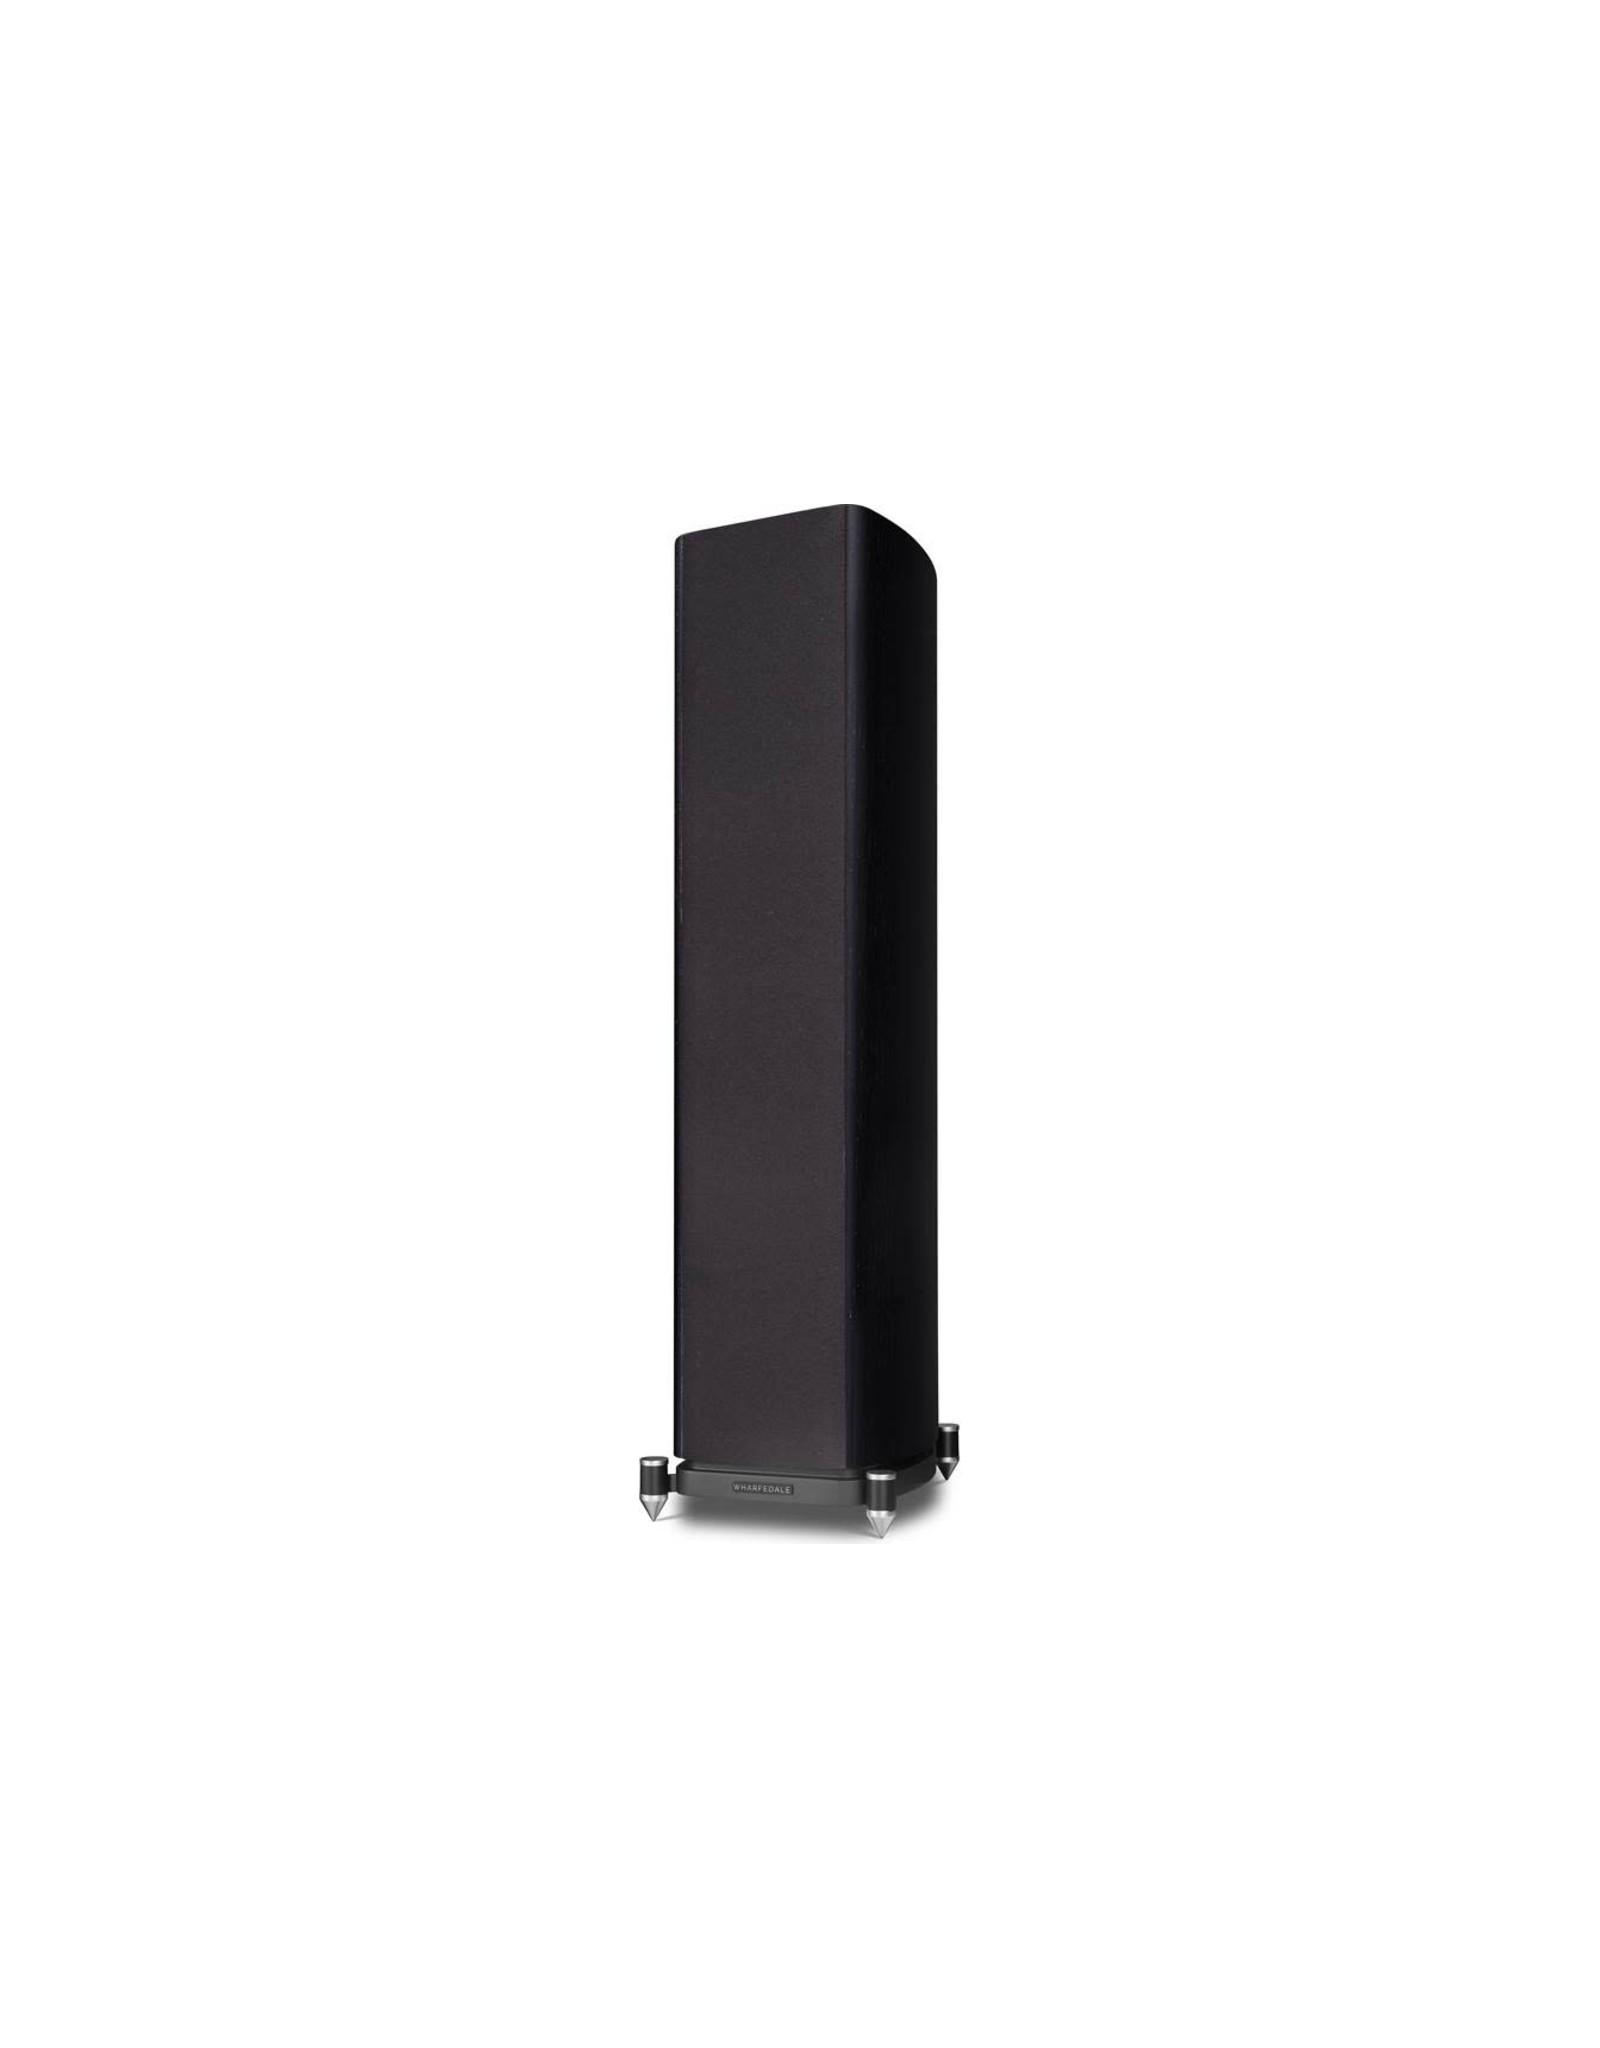 Wharfedale Wharfedale EVO4.3 Floorstanding Speakers